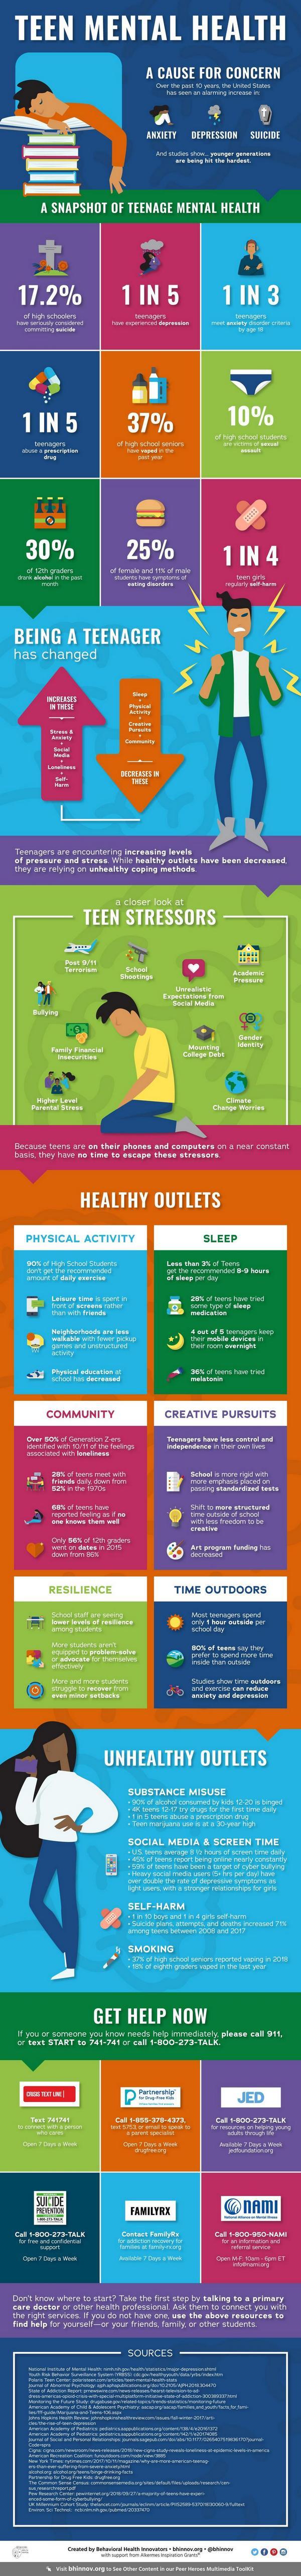 Teen-Mental-Health-Infographic-600